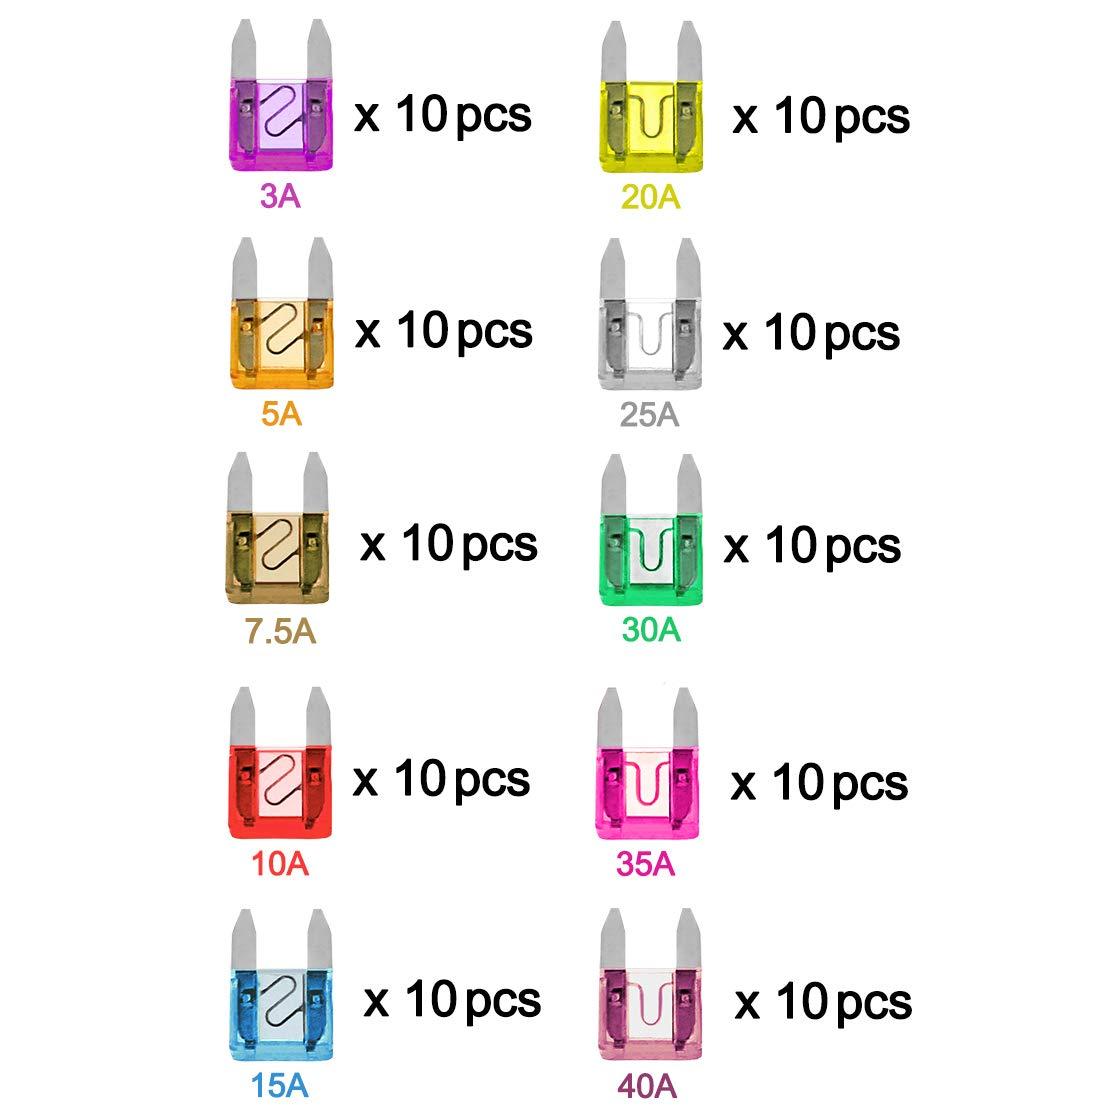 VANTRONIK Mini Blade Fuse 120PCS Assorted 5A 7.5A 10A 15A 20A 25A 30A Replacement APM//ATM Assortment Kit Set